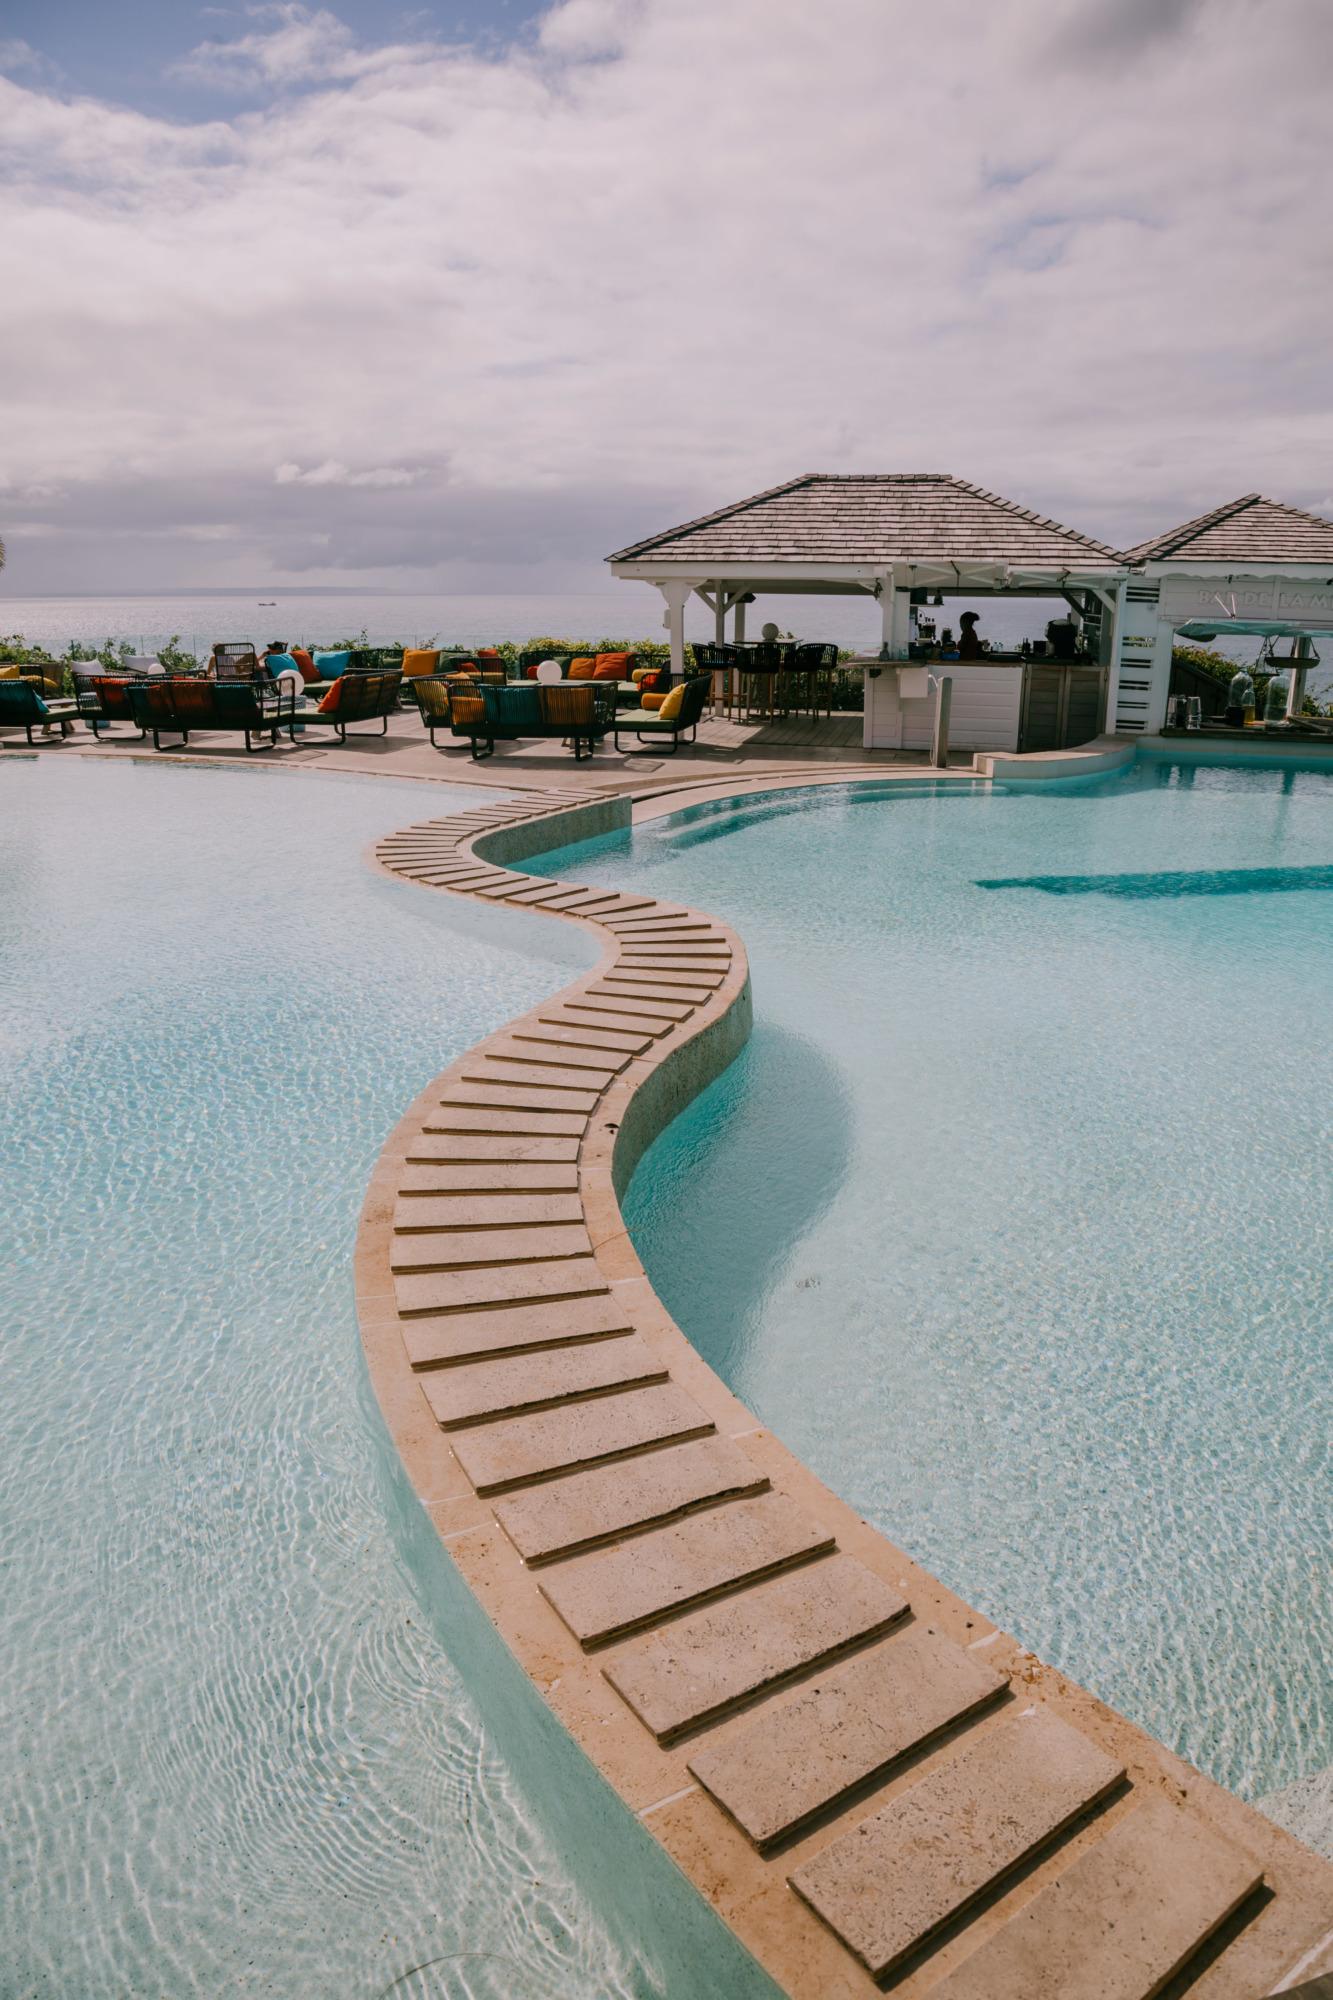 Hôtel Guadeloupe - Blondie Baby blog voyages